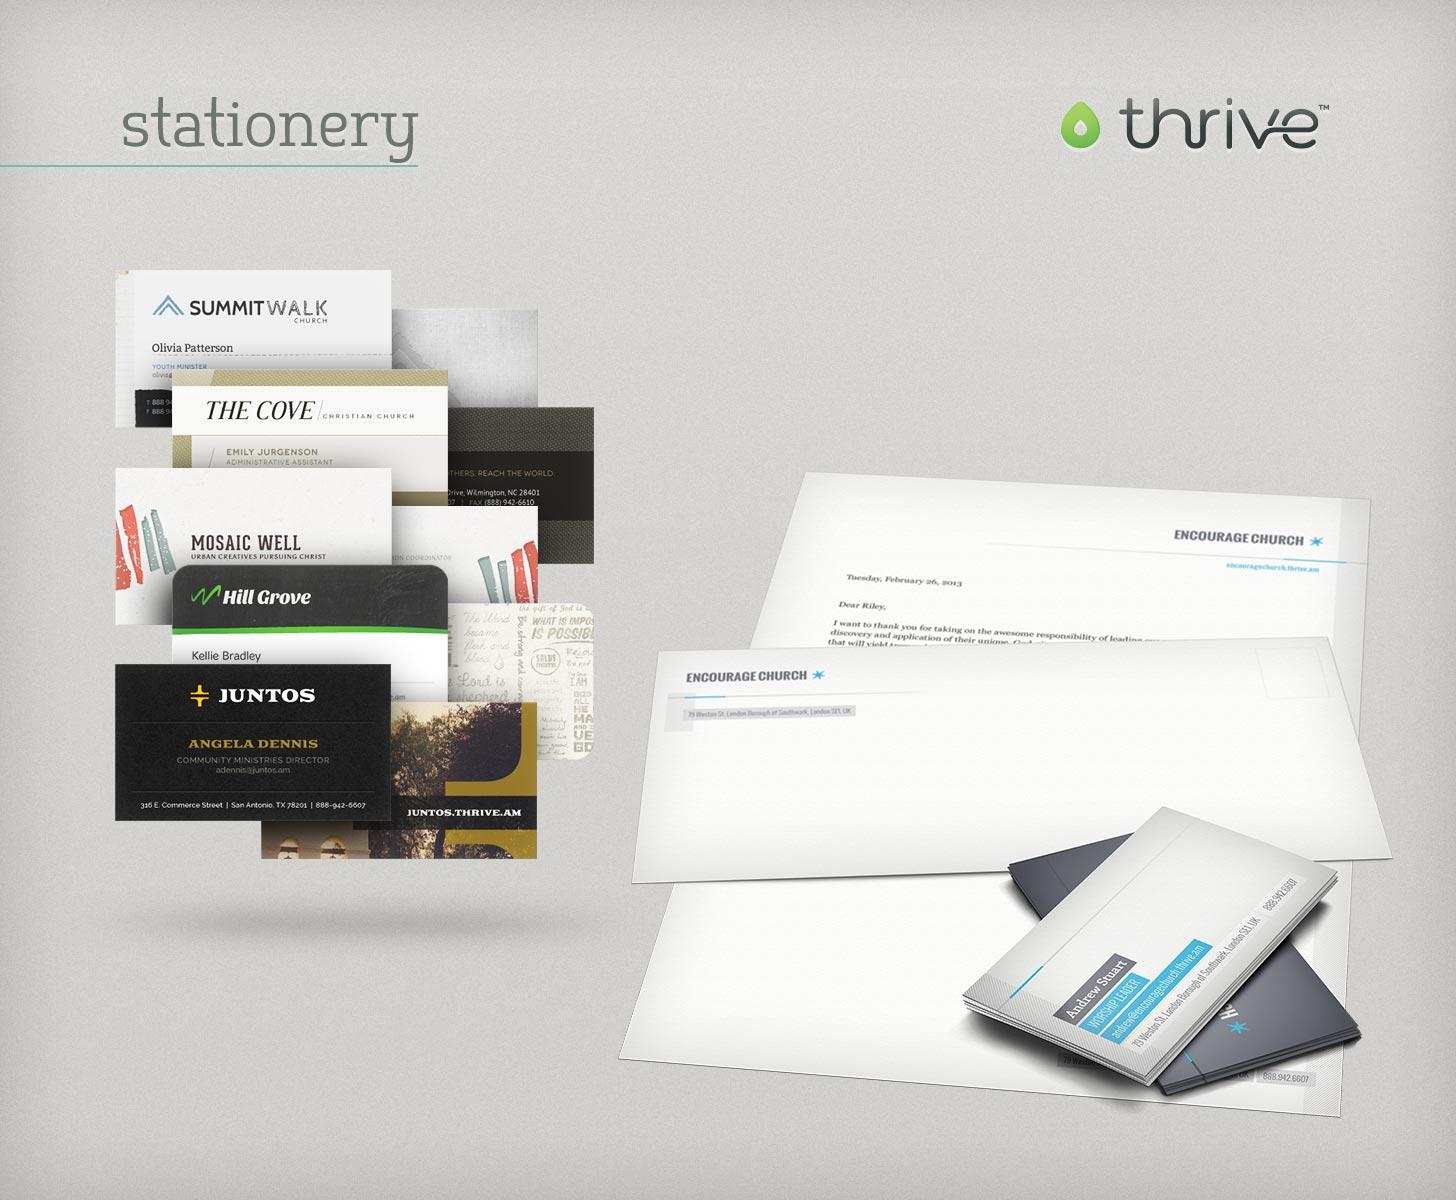 Thrive stationery themes